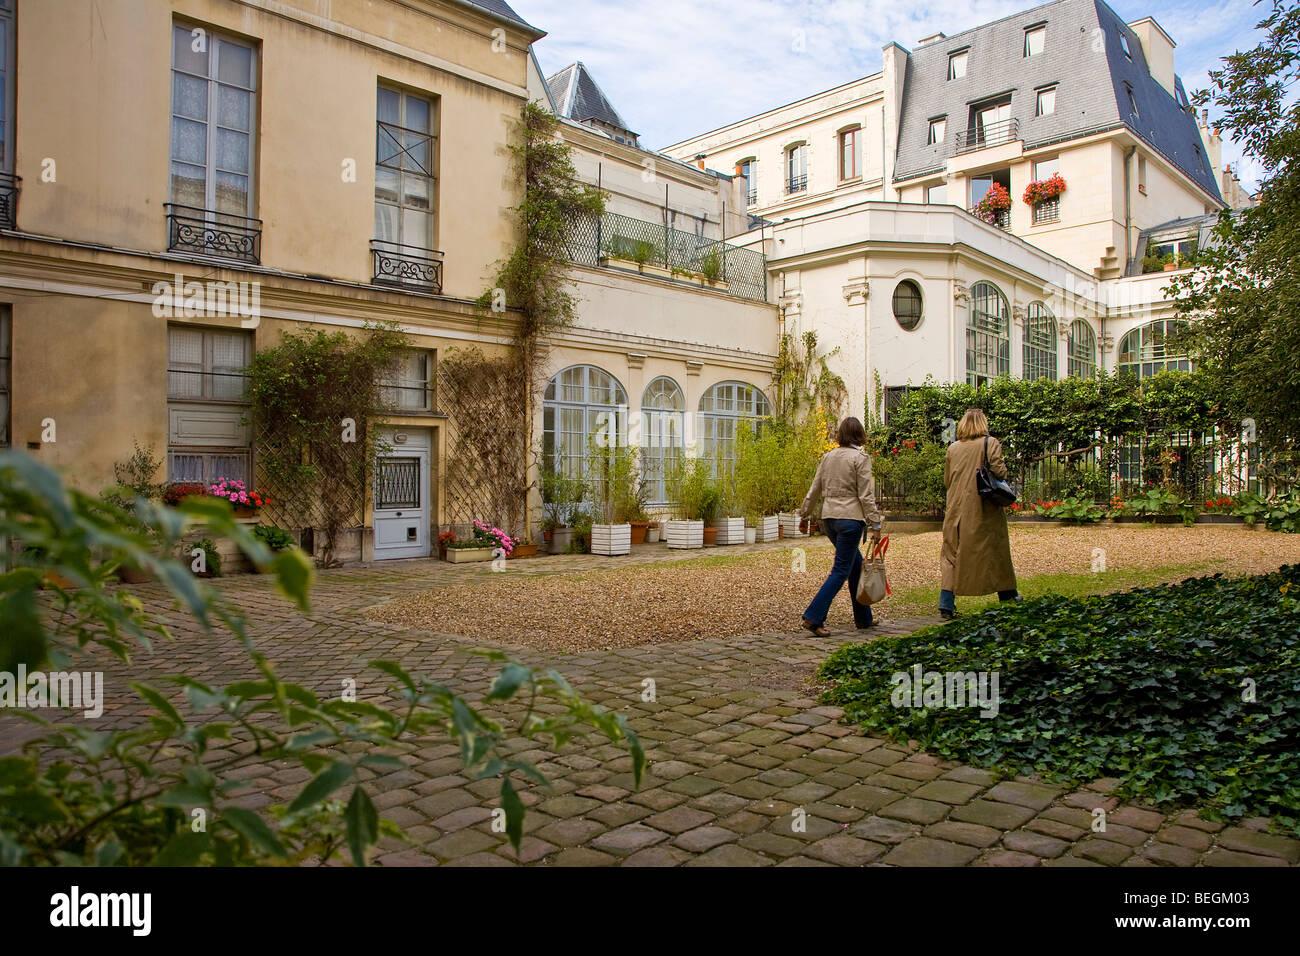 COURTYARD IN THE MARAIS DISTRICT, PARIS - Stock Image